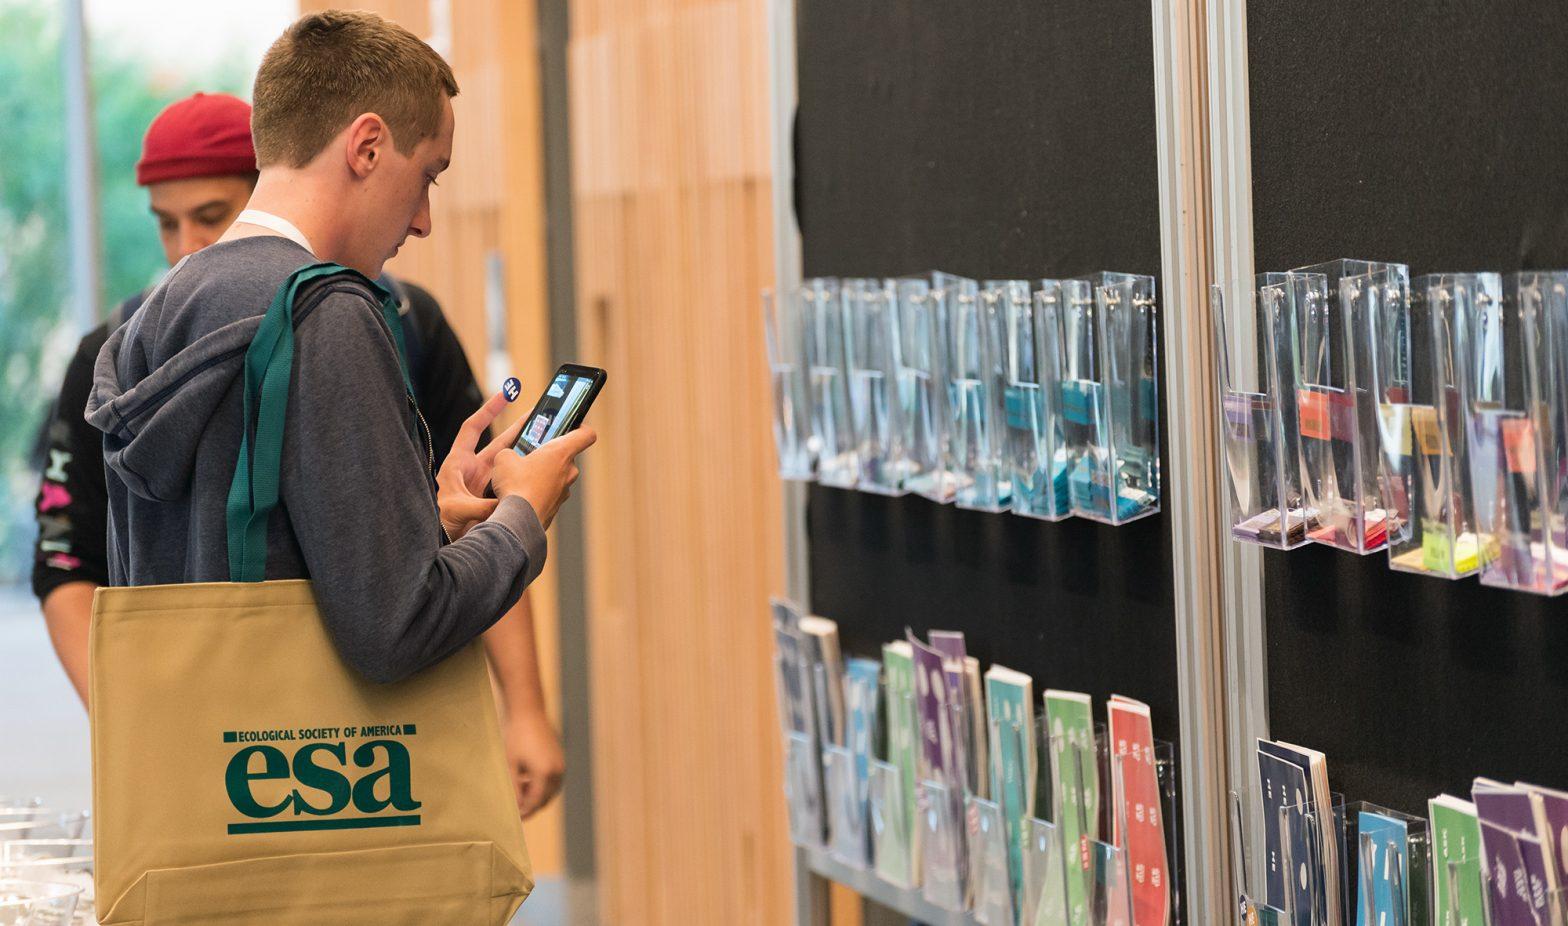 An ESA attendee at an in-person meeting checks their phone for meeting FAQs.